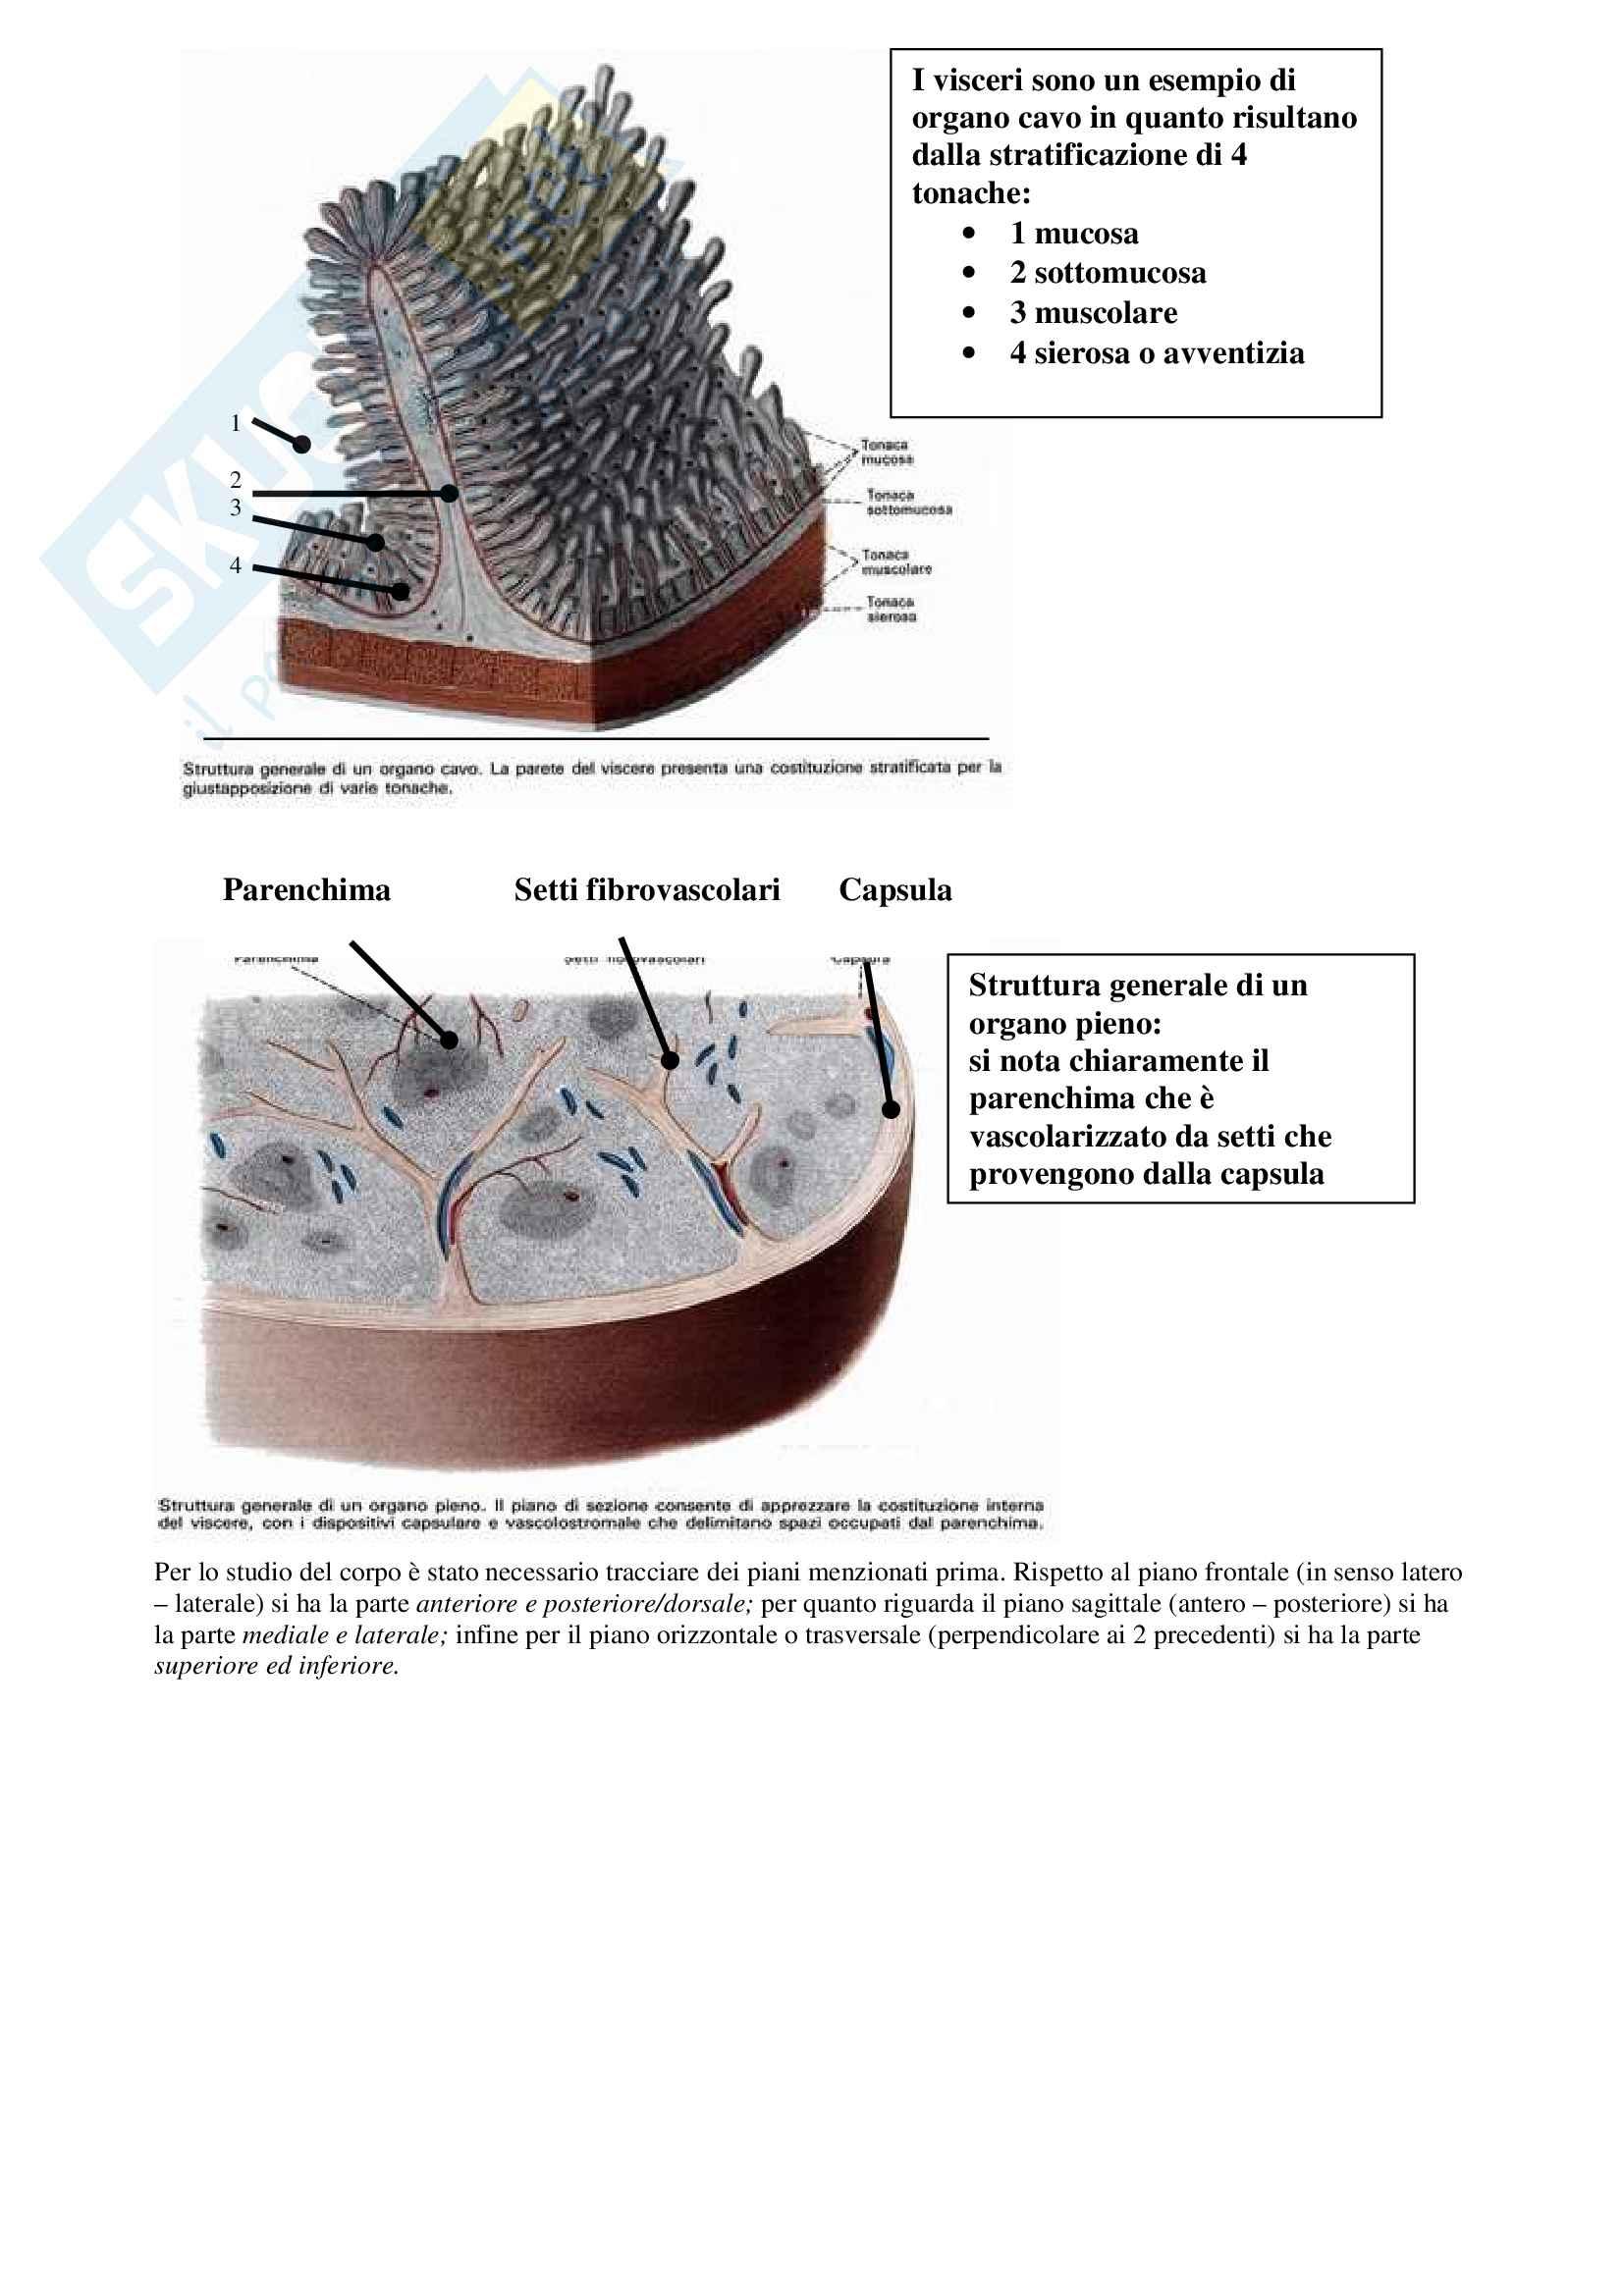 Anatomia generale Pag. 2